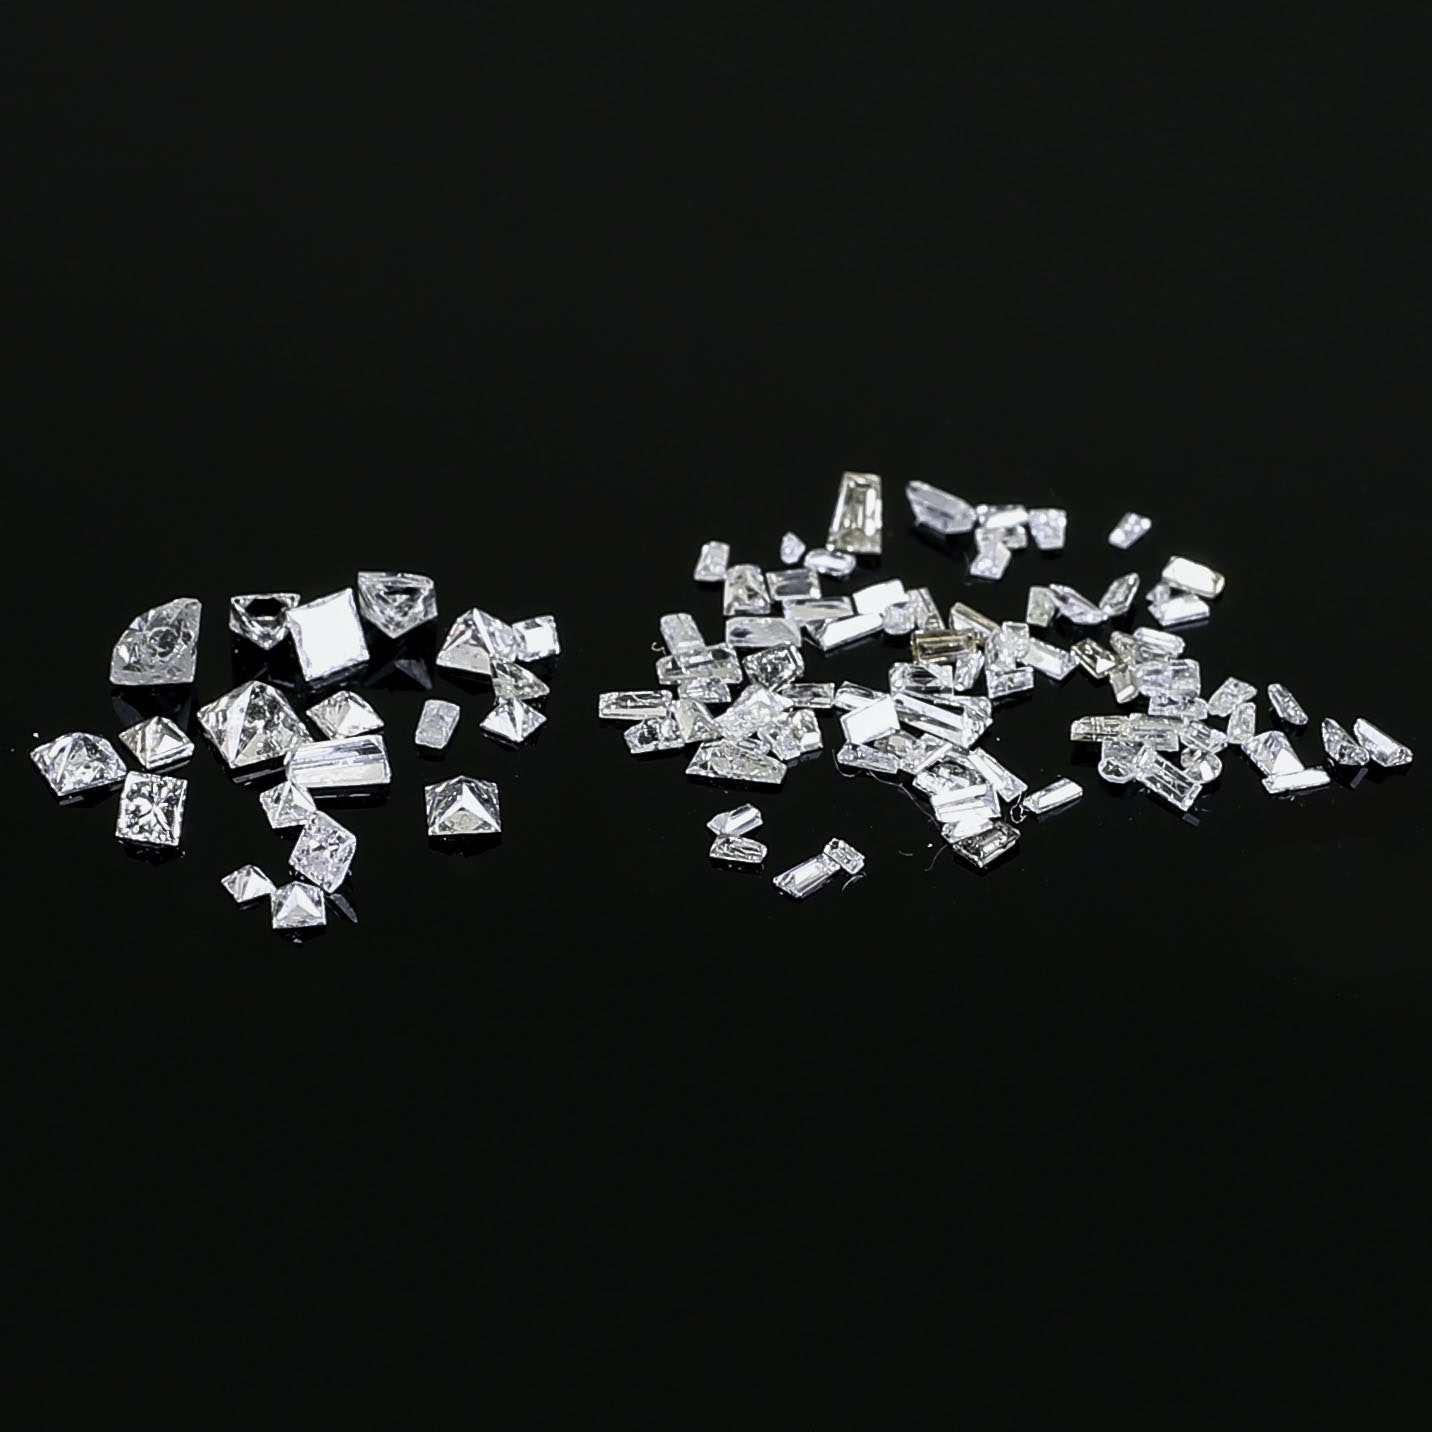 2.09 CTW Loose Baguette and Princess Cut Diamonds